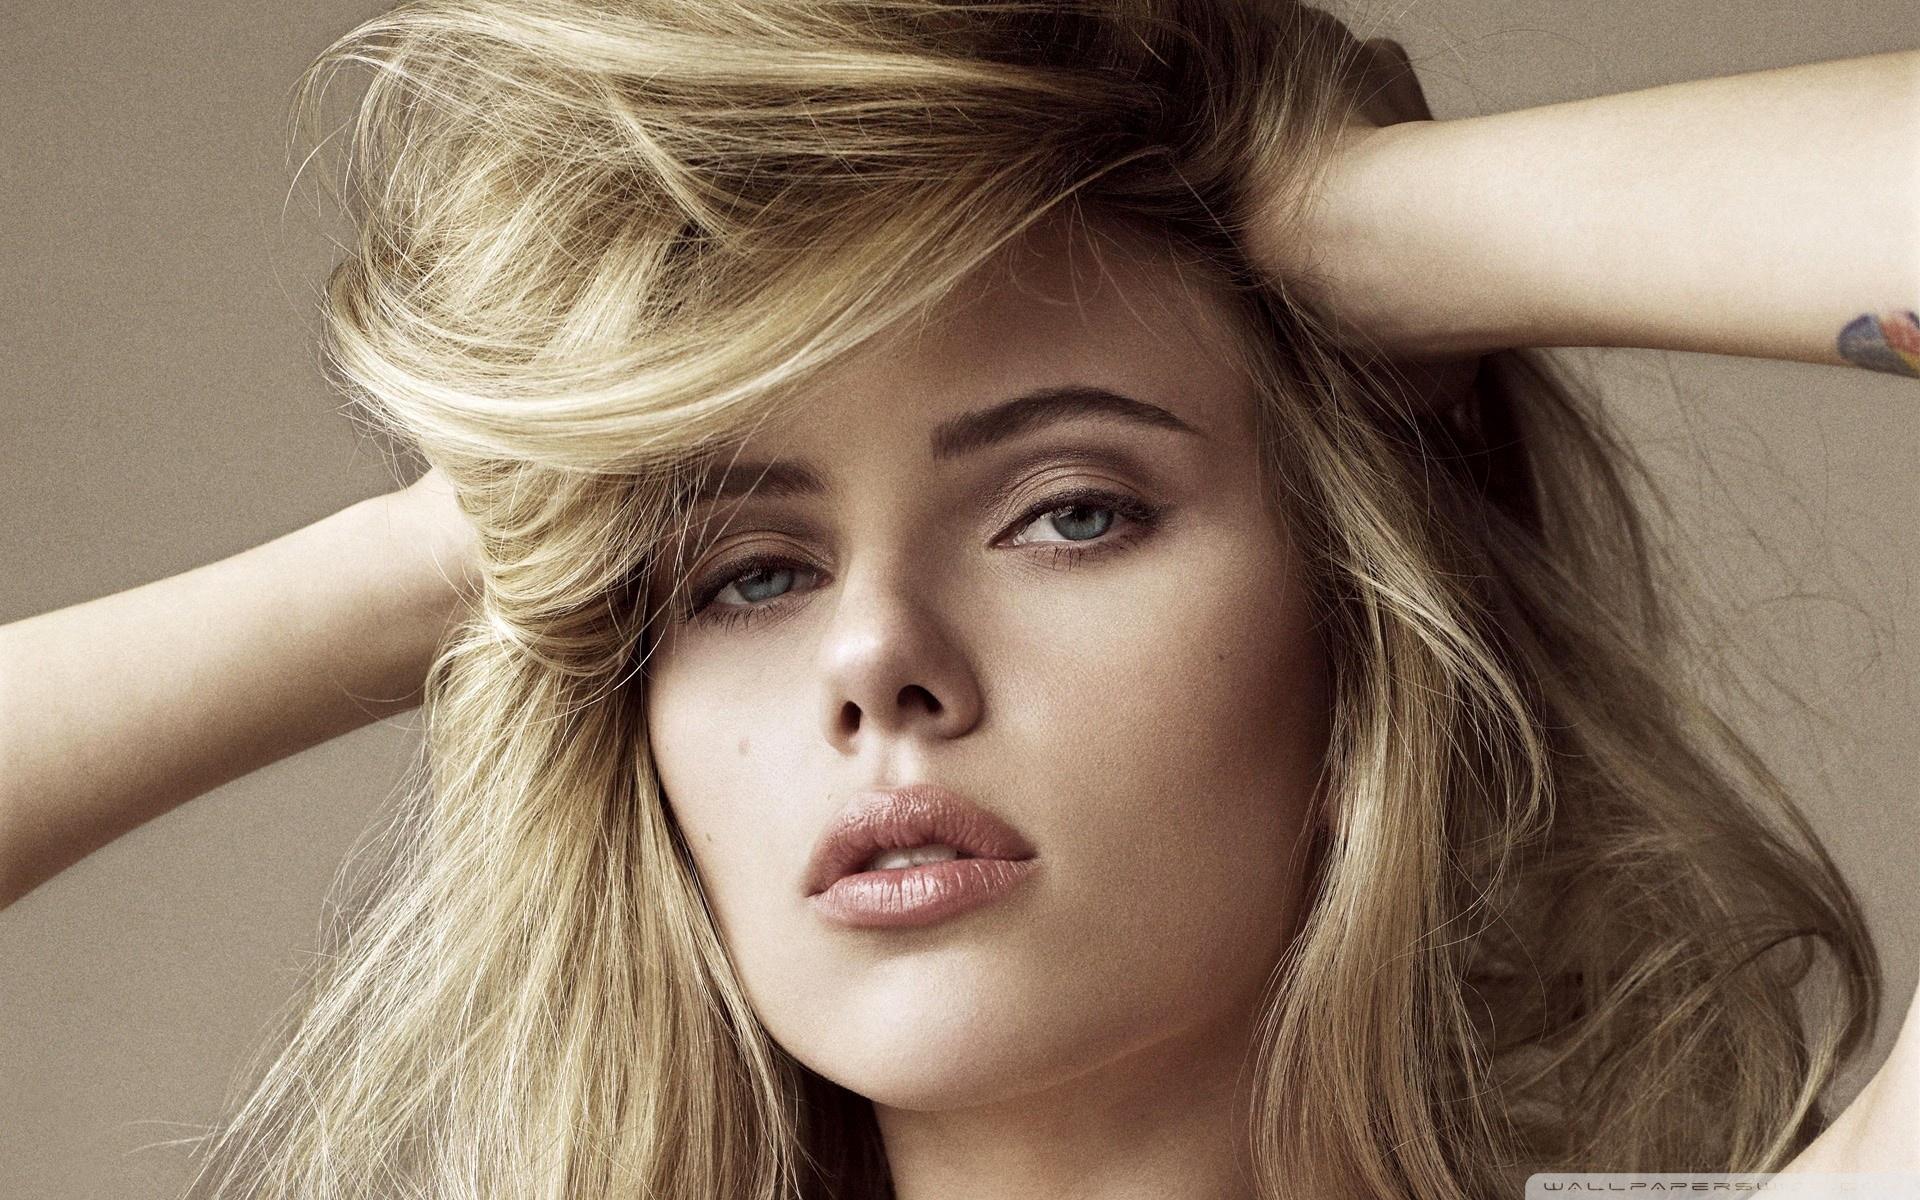 Scarlett Johansson Blonde Wallpapers Wallpaper Cave